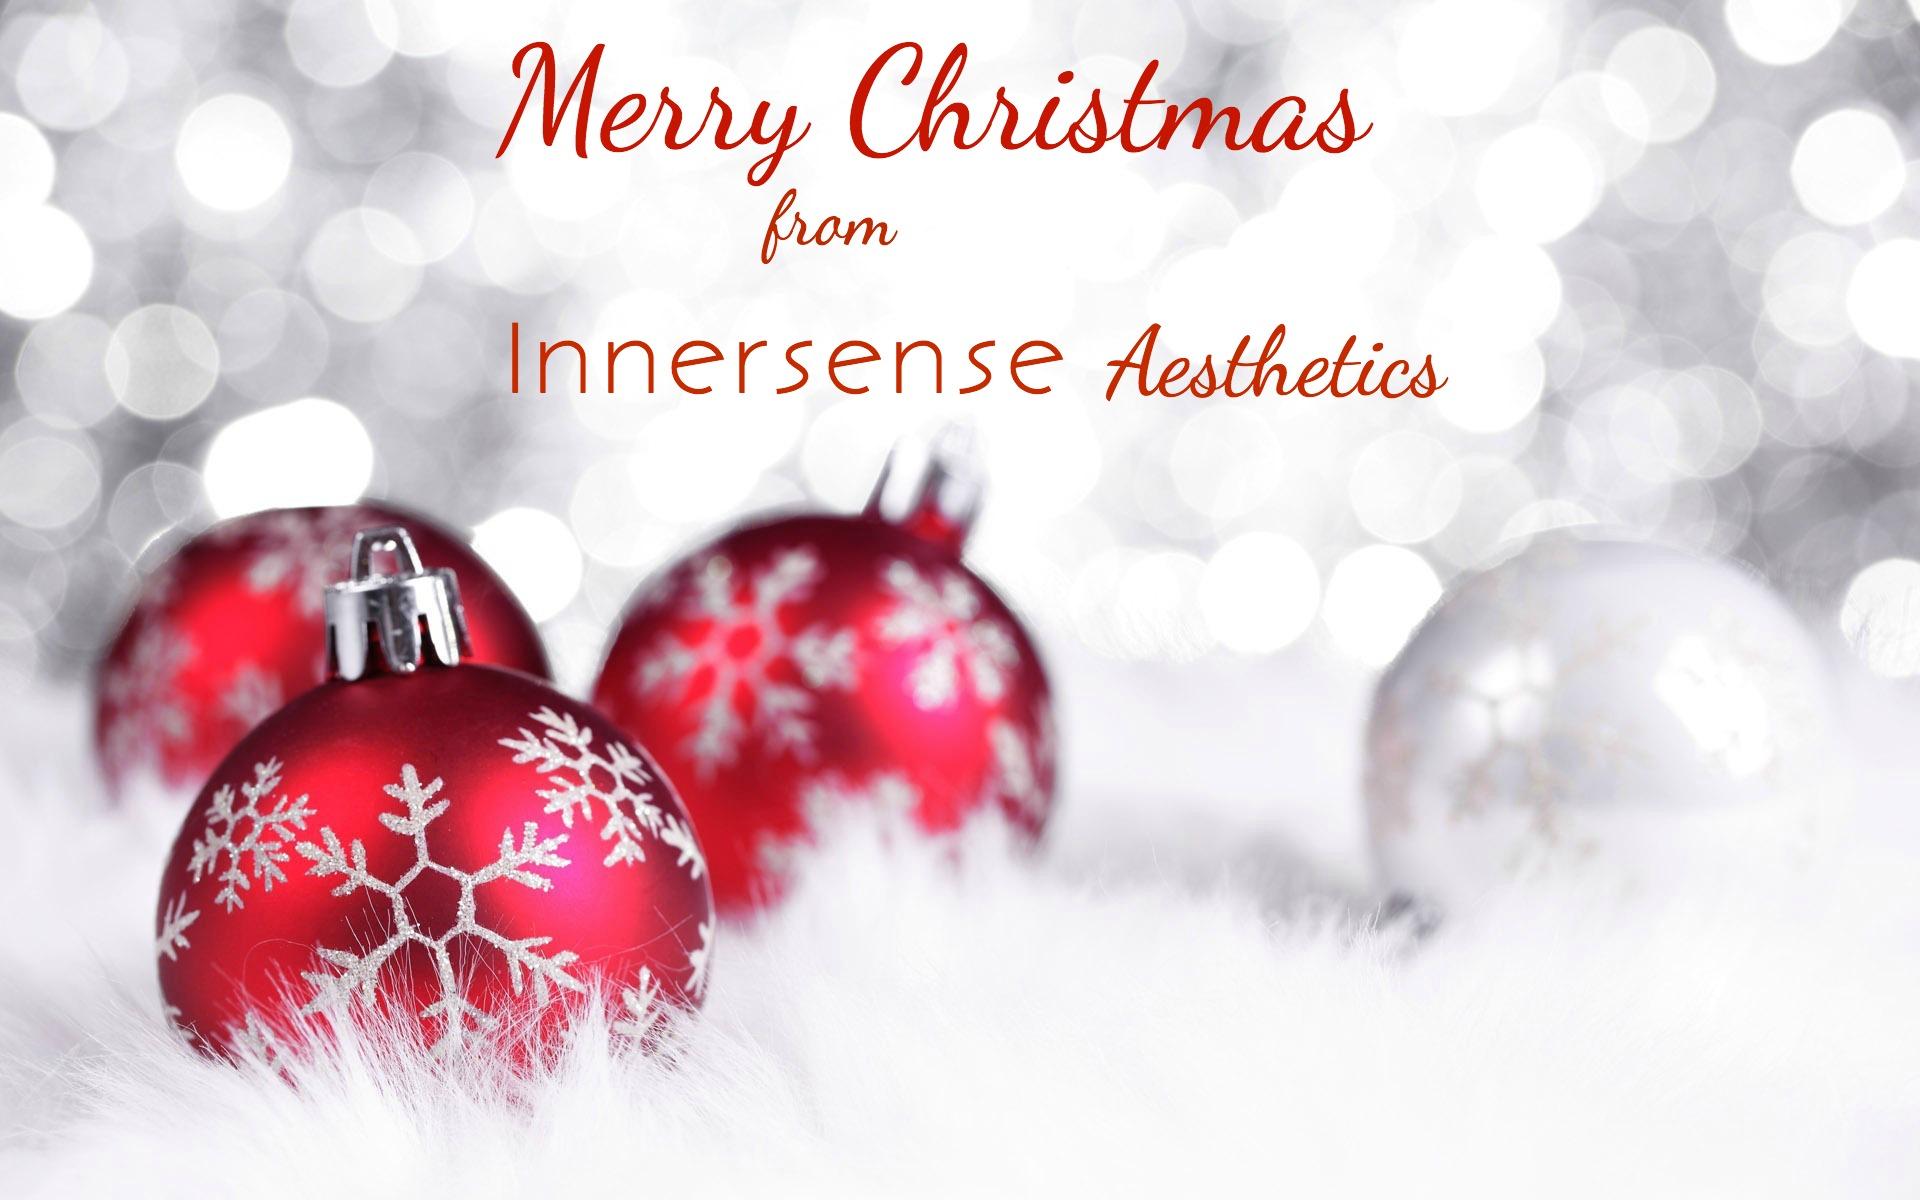 We Wish You a Merry Christmas! - Innersense Aesthetics